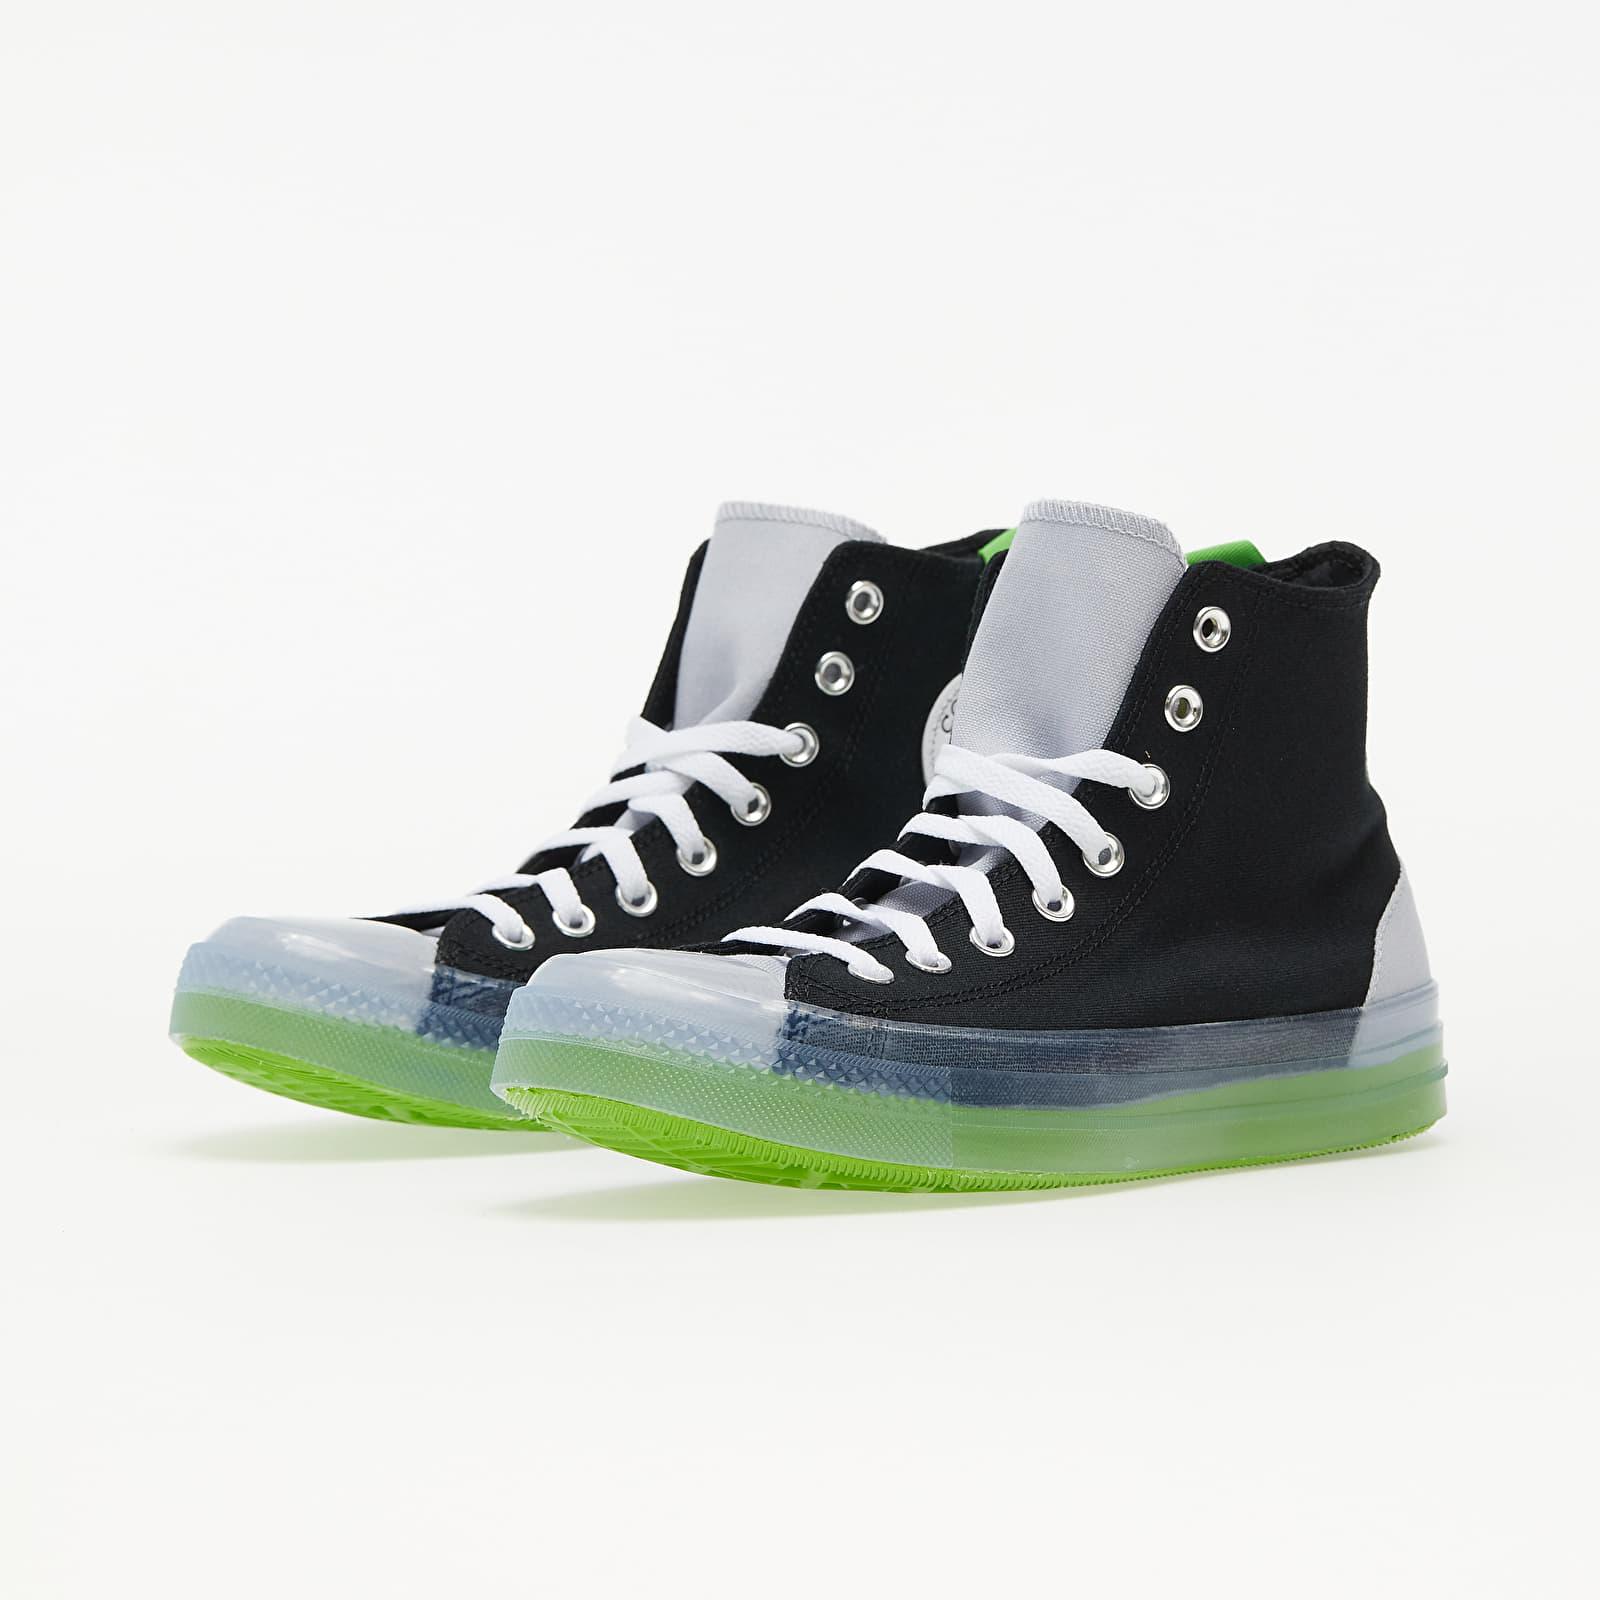 Converse Chuck Taylor All Star CX Black/ Gravel/ Bold Wasabi   Footshop